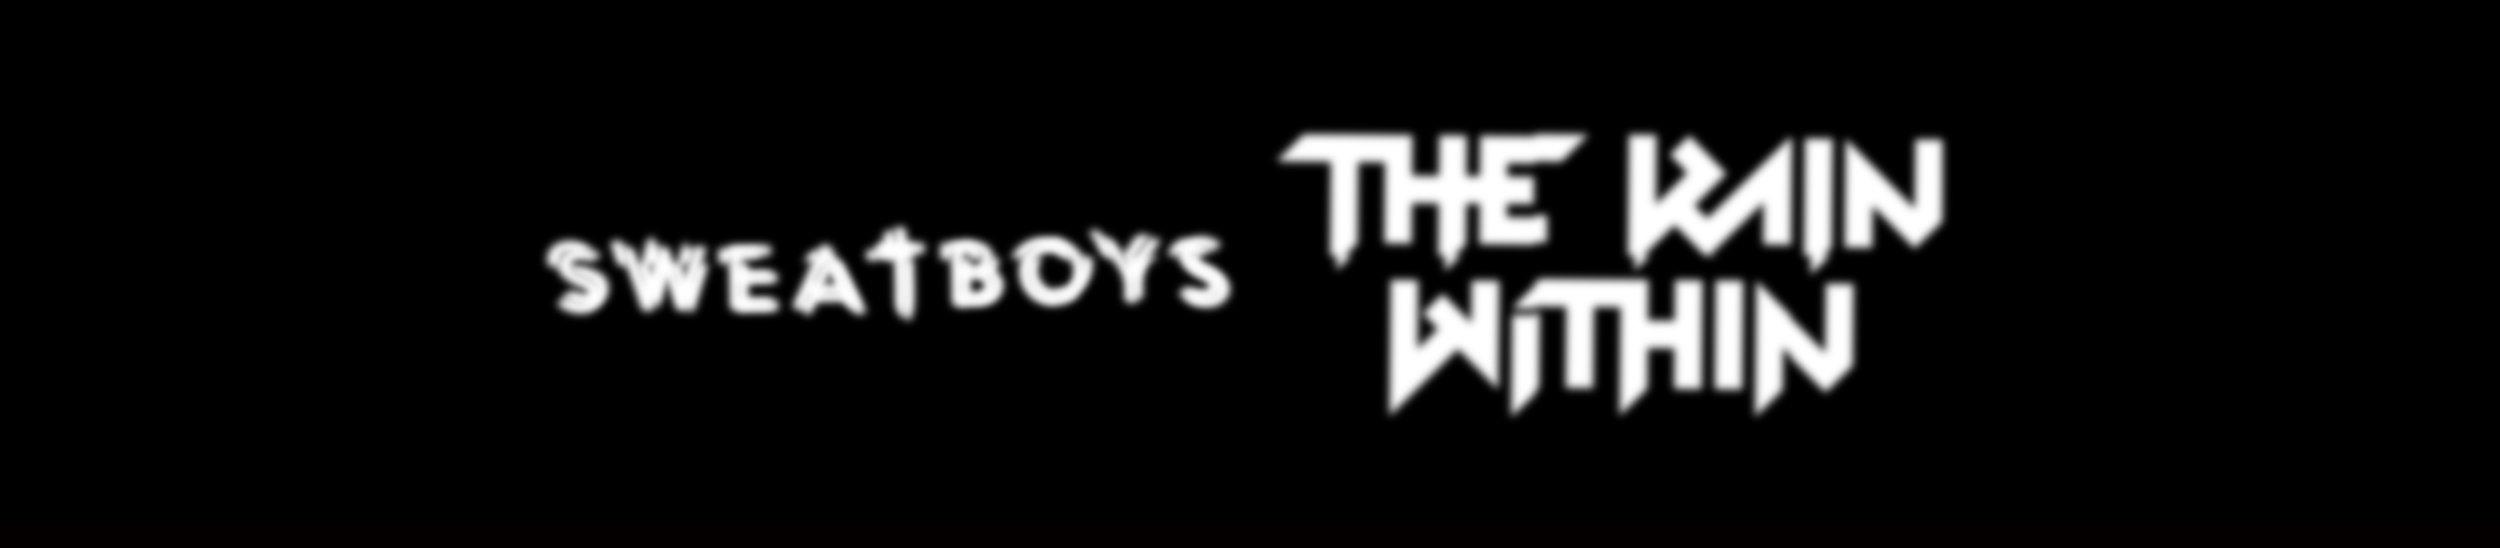 sweat_boys_the_rain_within_logos.jpg